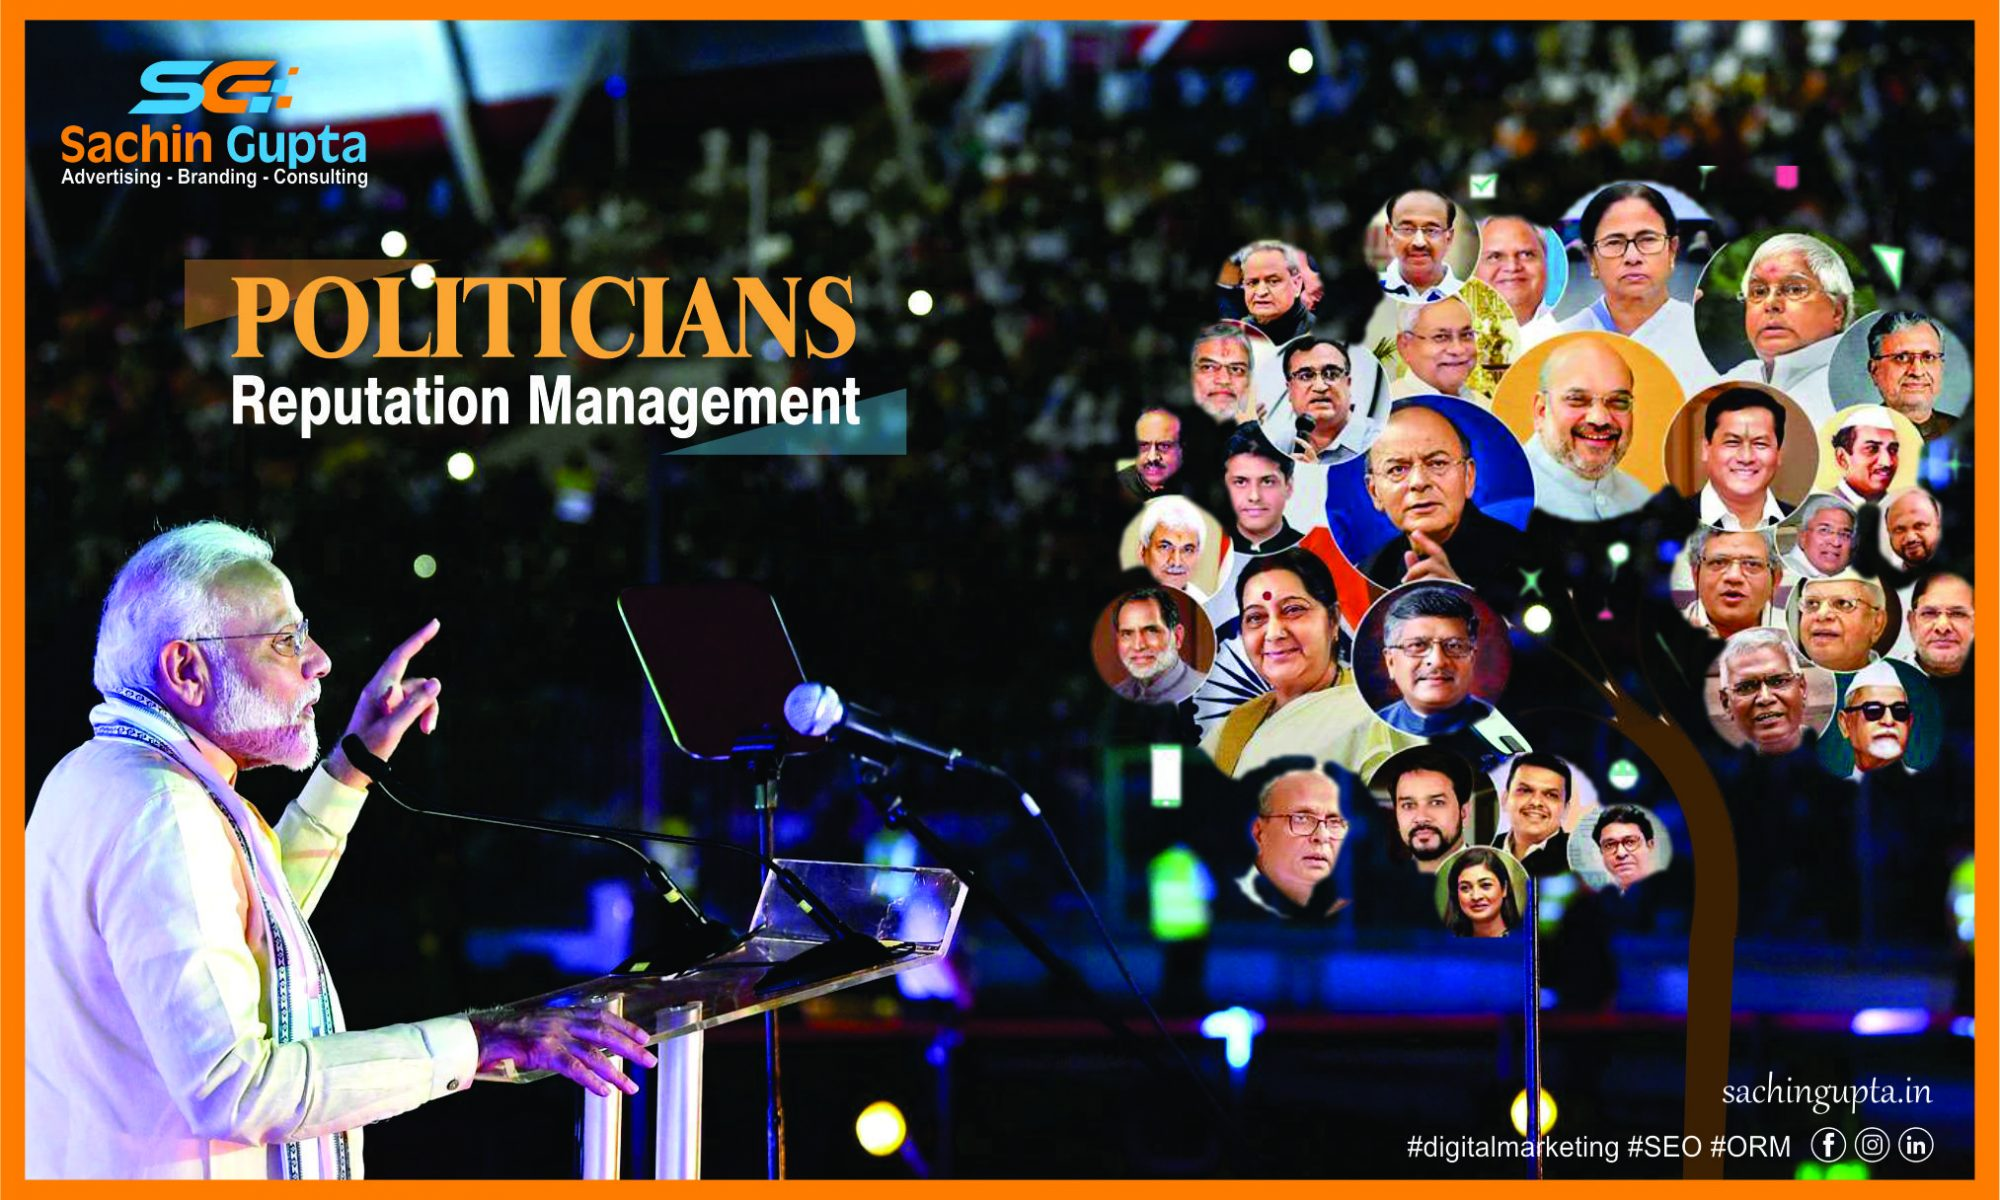 politician reputation management